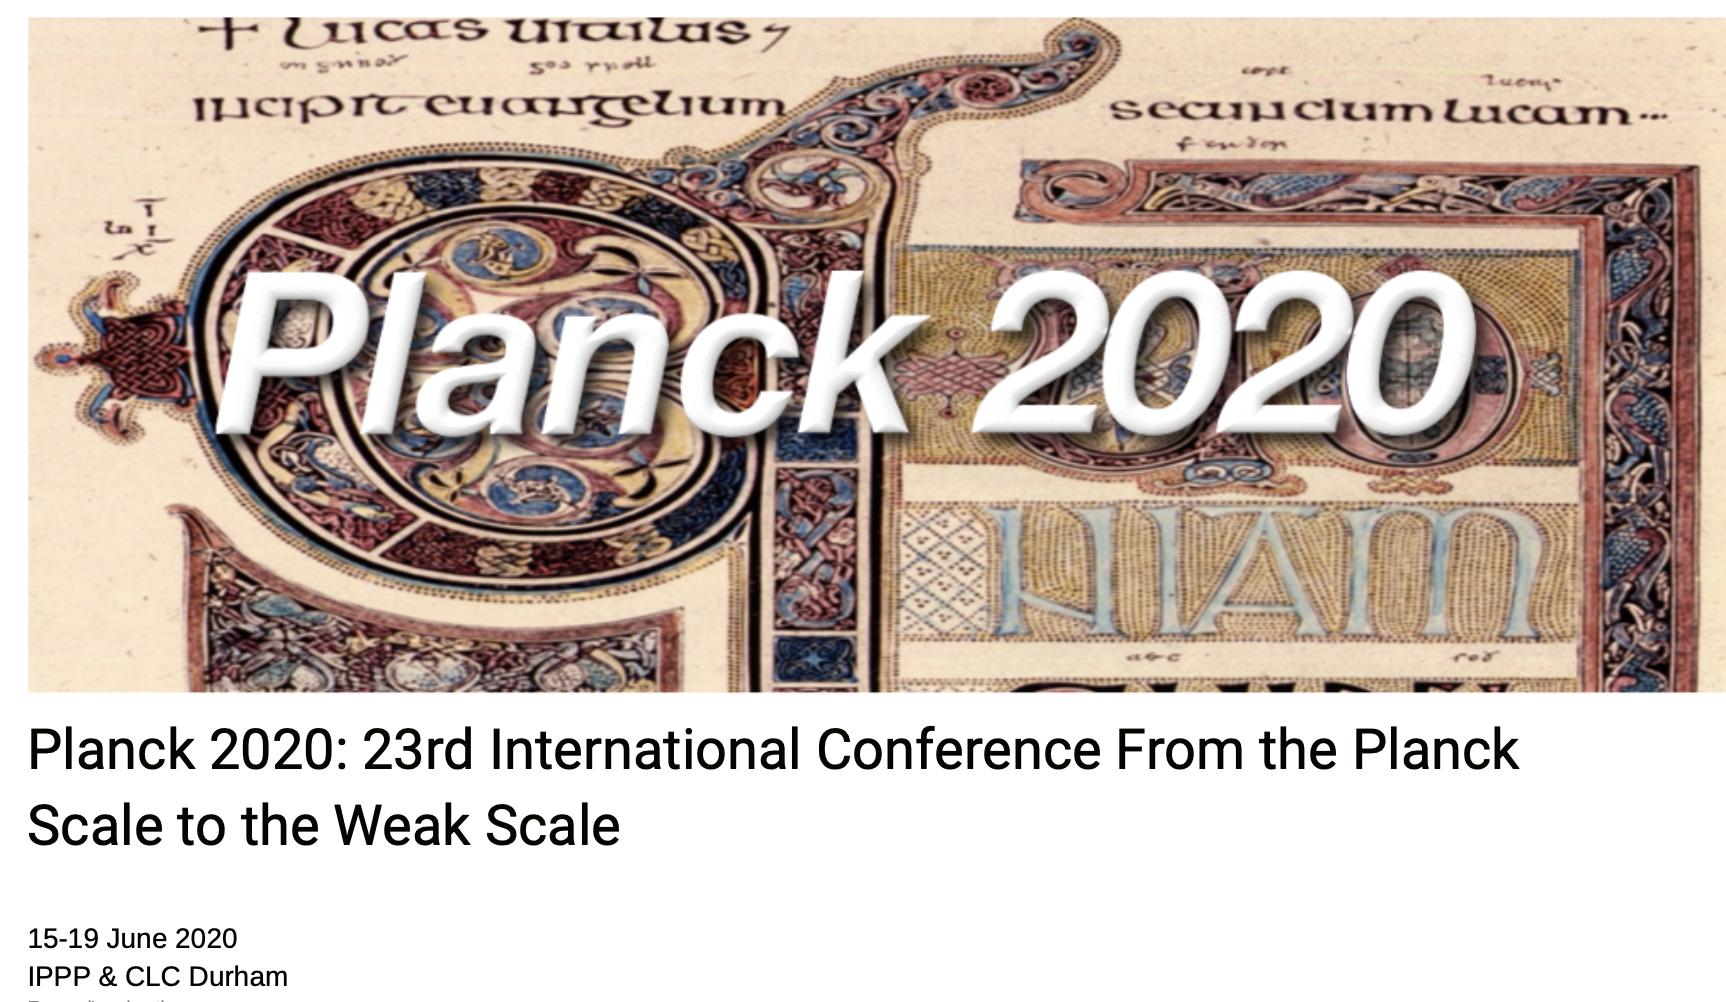 Planck 2020